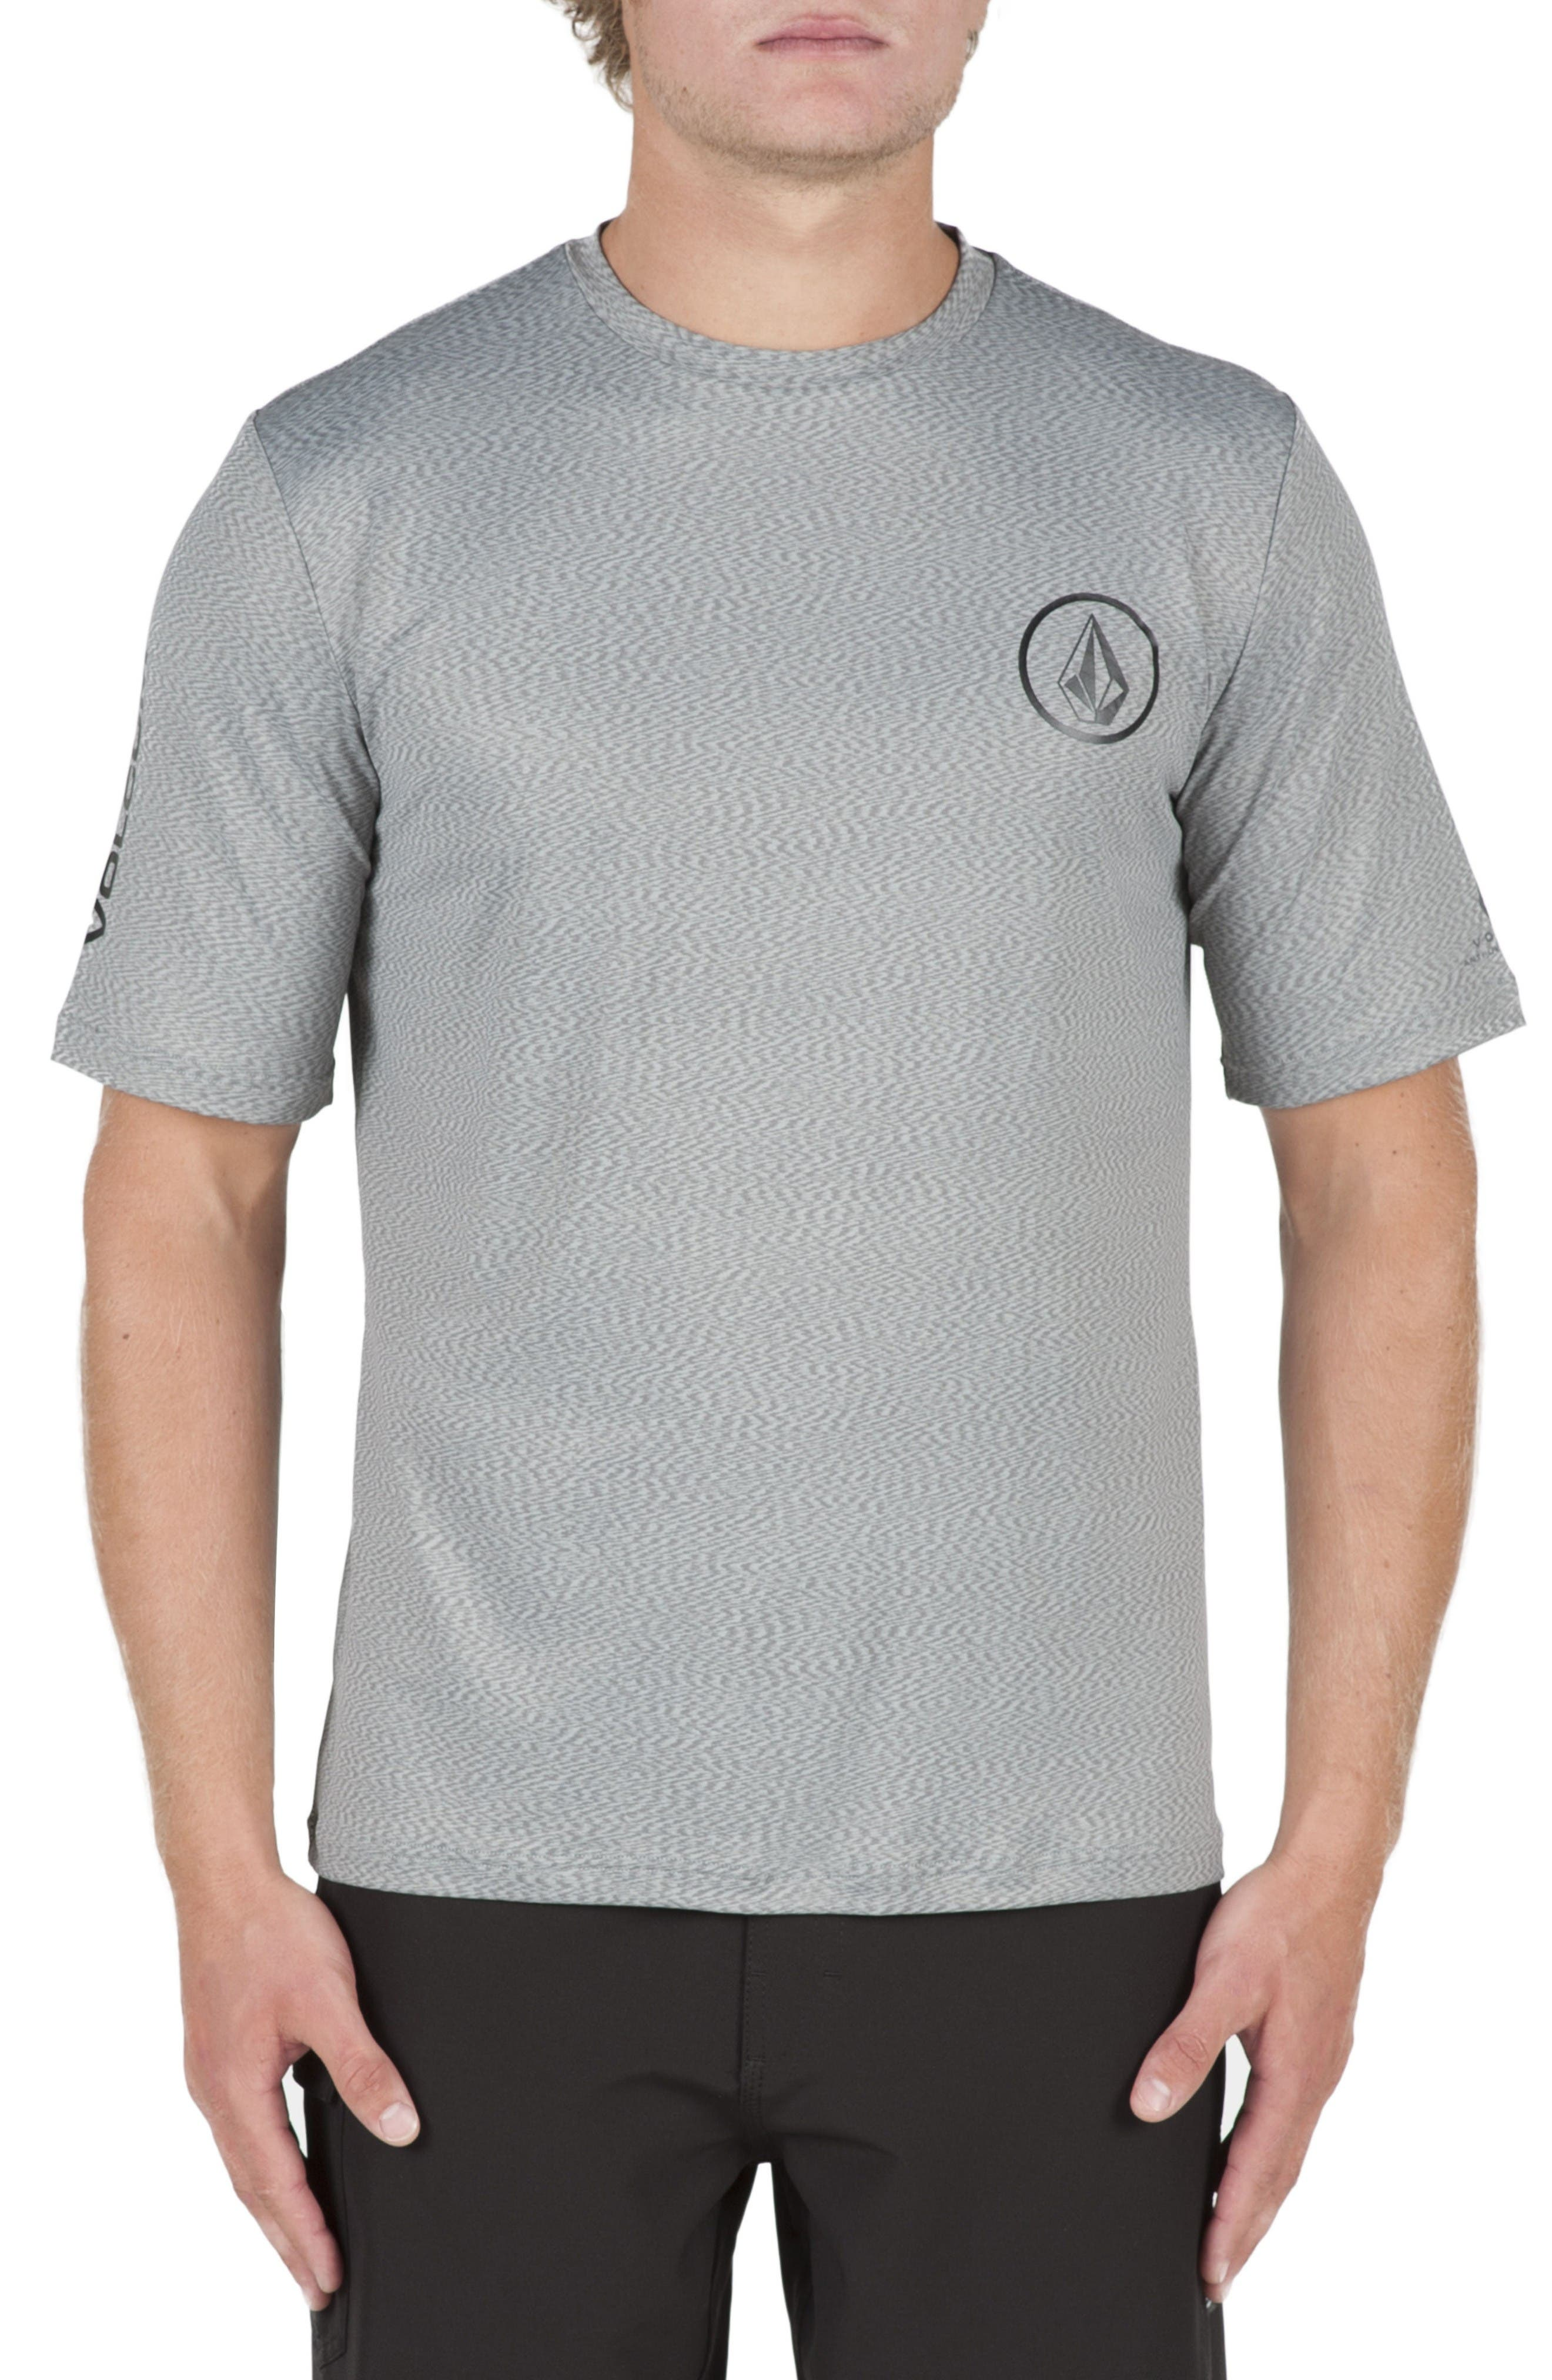 Volcom Short Sleeve Rashguard